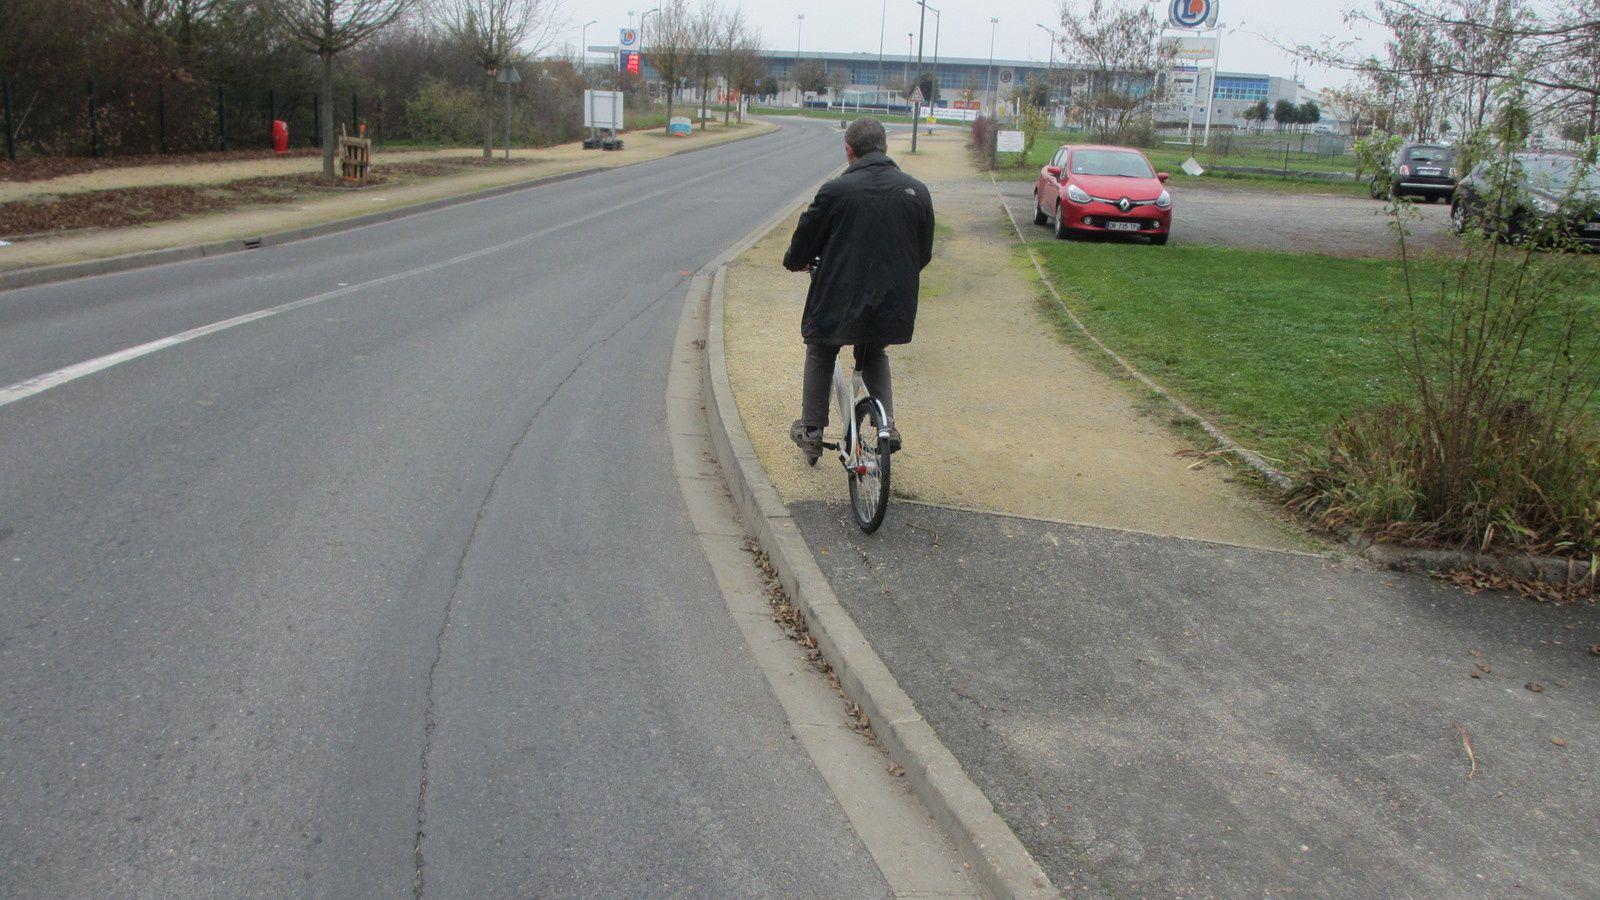 En novembre 2015 il n'y a plus de piste cyclable !